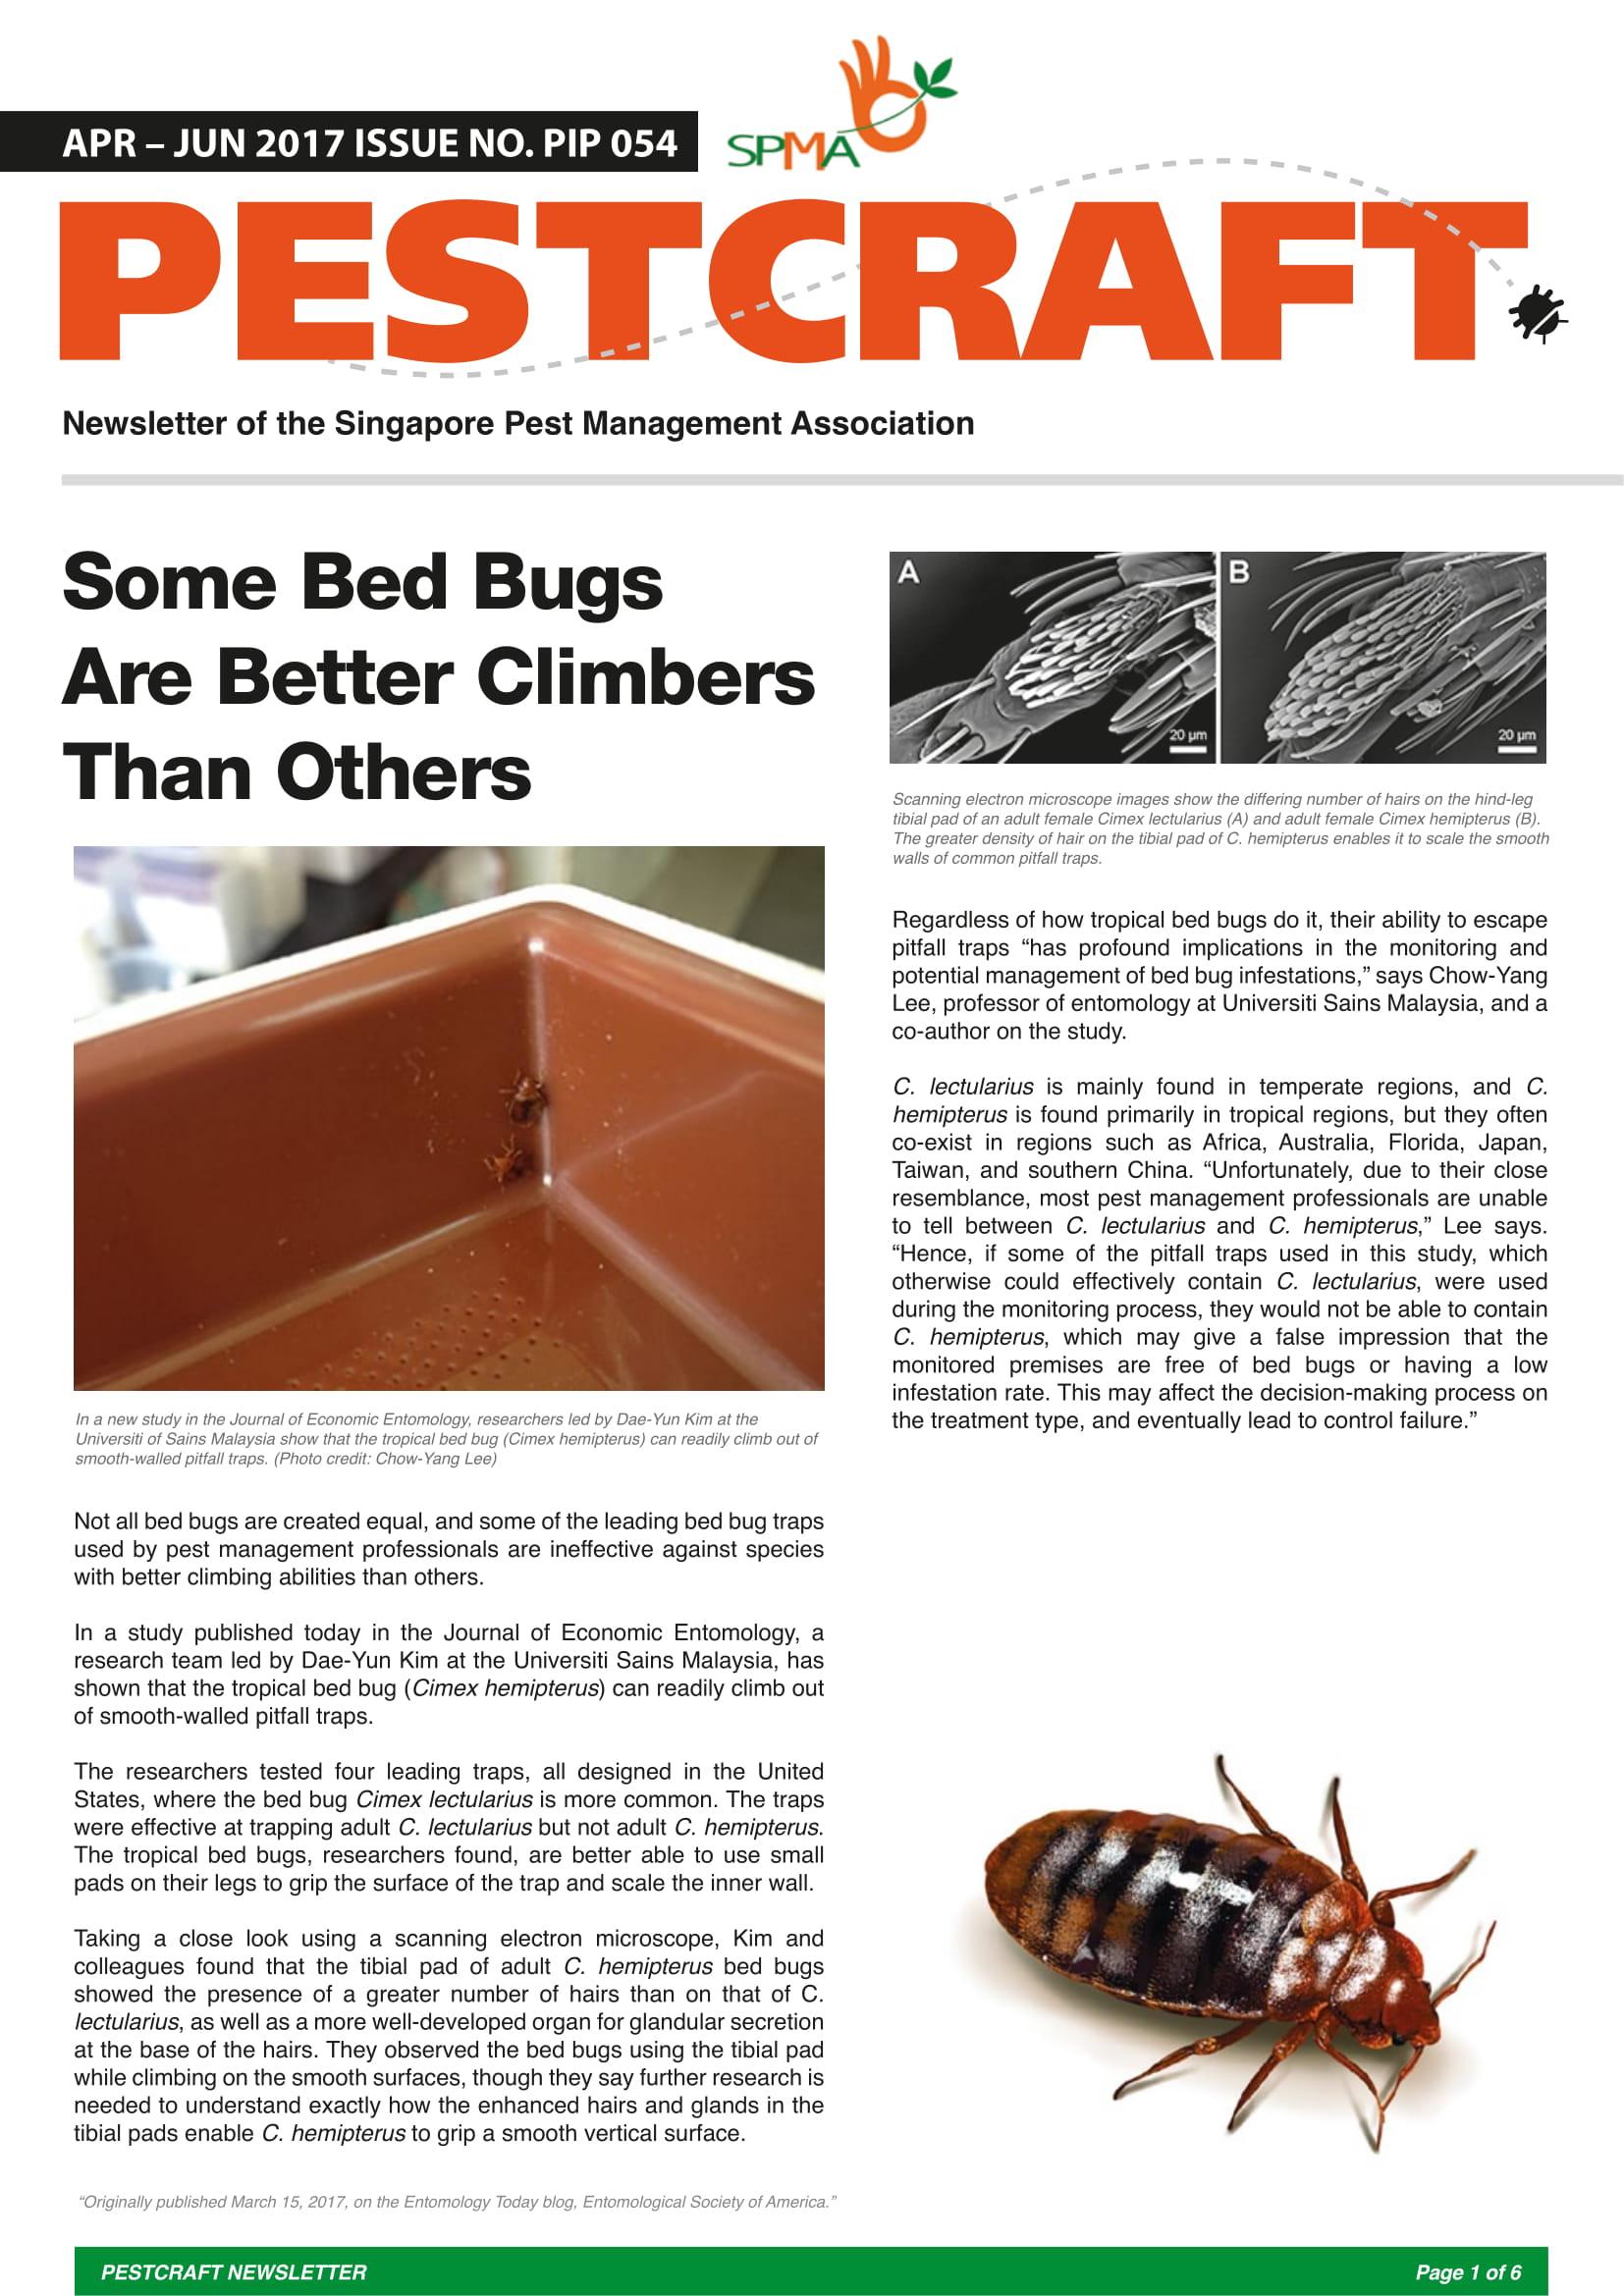 Pestcraft-Apr-Jun 2017 issue-1.jpg